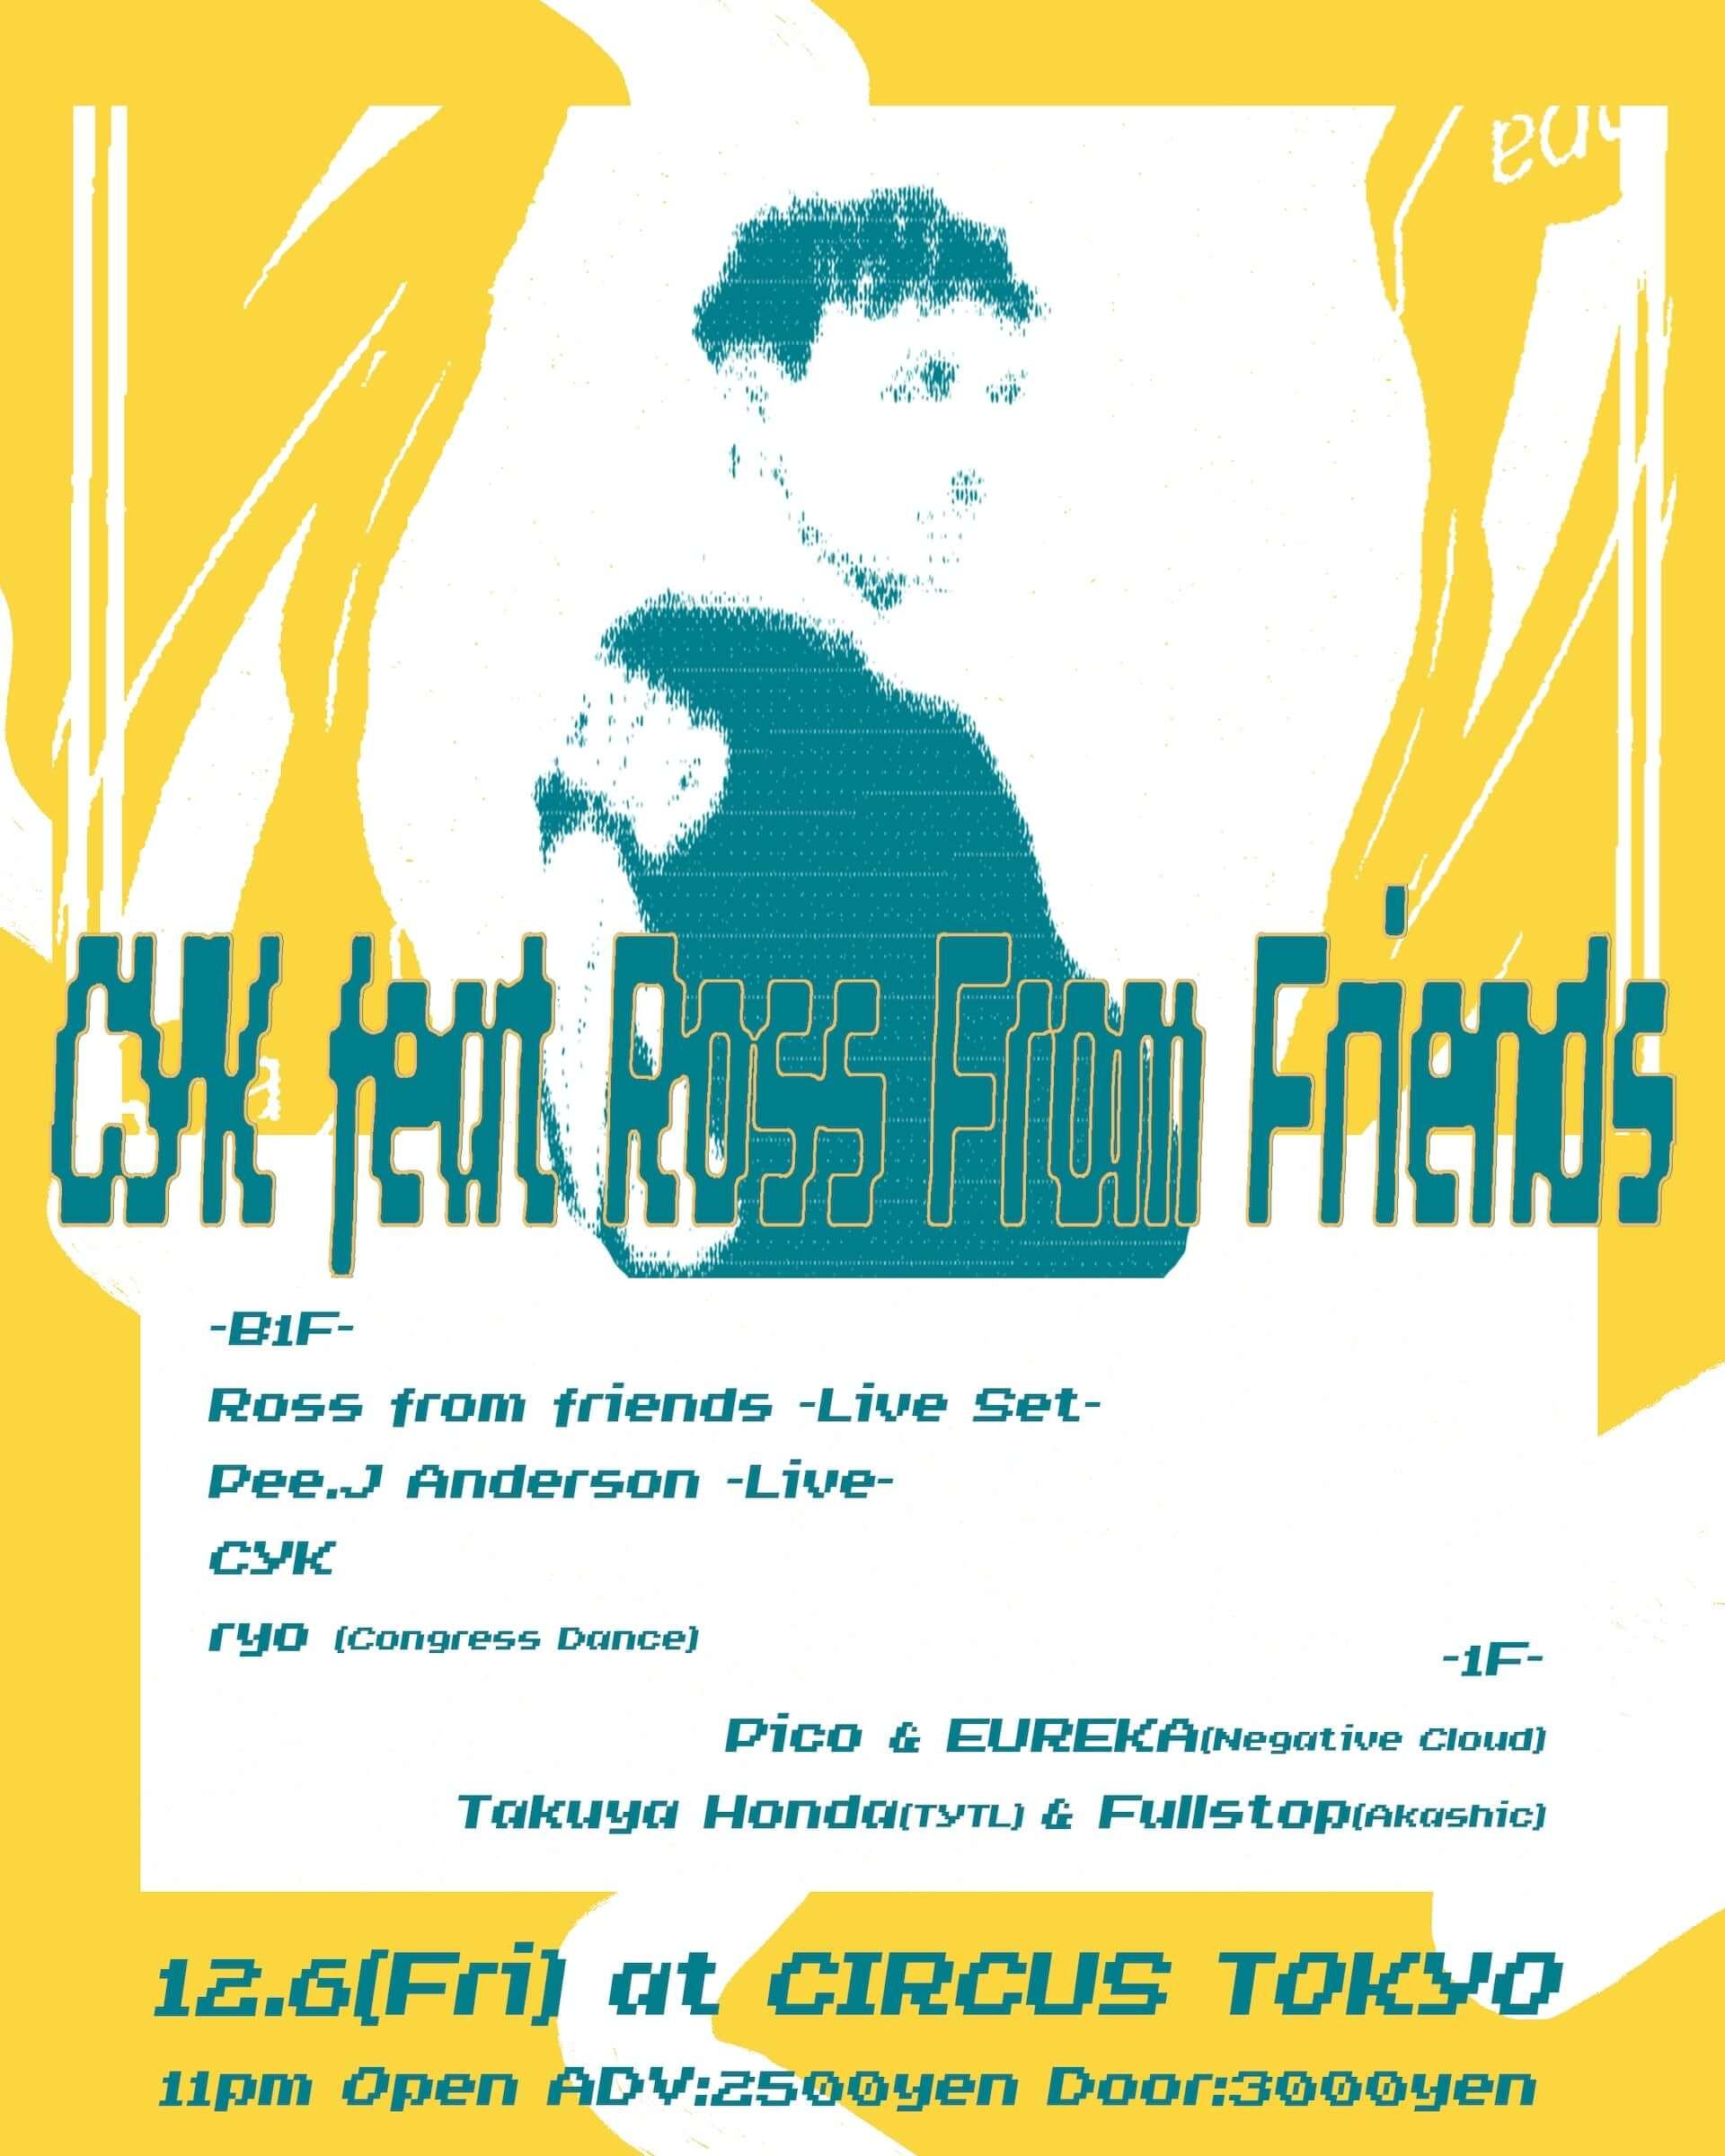 Ross From Friends初クラブツアーの出演者が決定|東京公演をCYKがトータルオーガナイズ music191119_rfftour2019_1-1920x2400